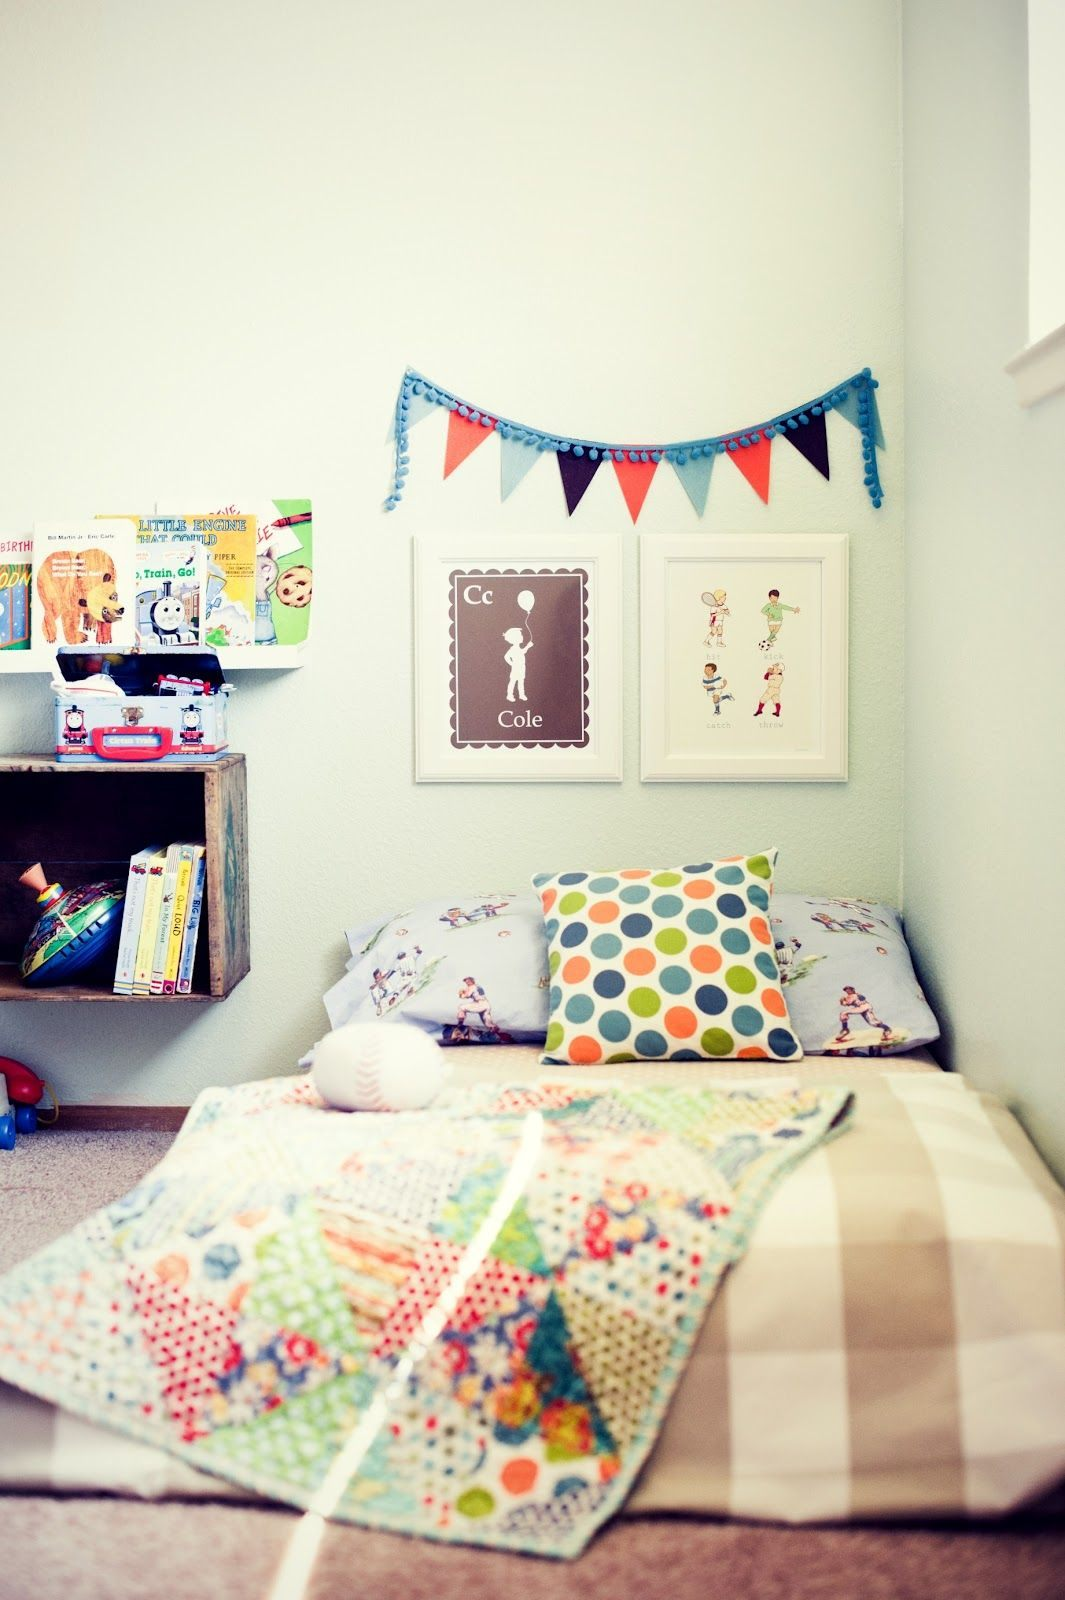 Lit Enfant Montessori Joli Mattress On the Floor = toddler Bed Montessori Nursery